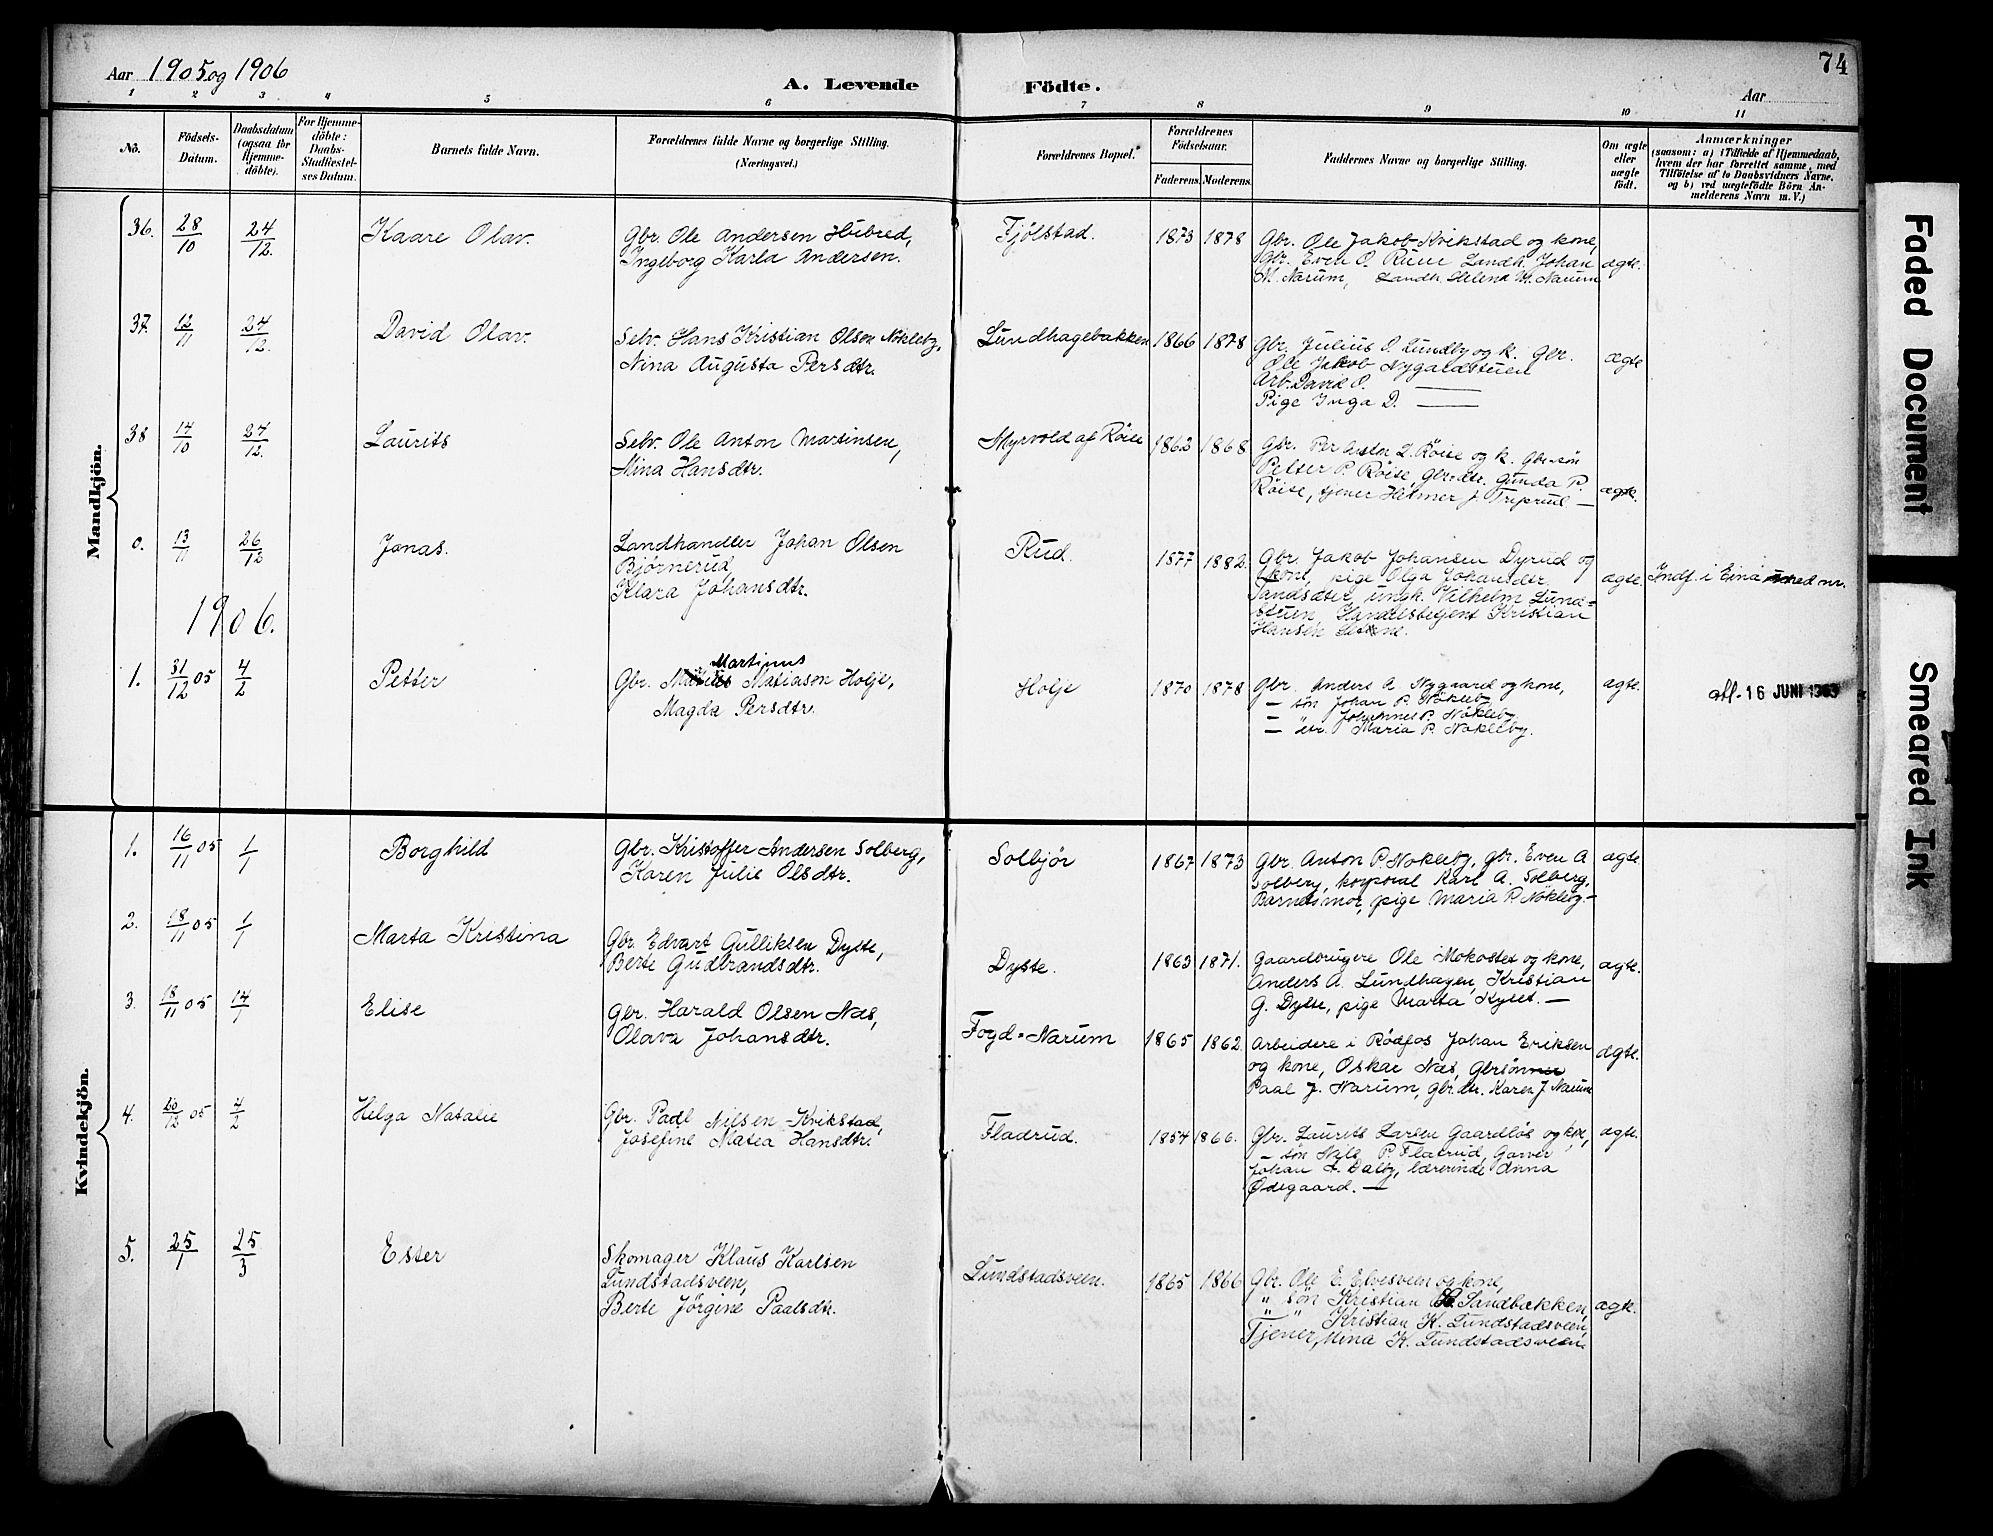 SAH, Vestre Toten prestekontor, H/Ha/Haa/L0013: Ministerialbok nr. 13, 1895-1911, s. 74